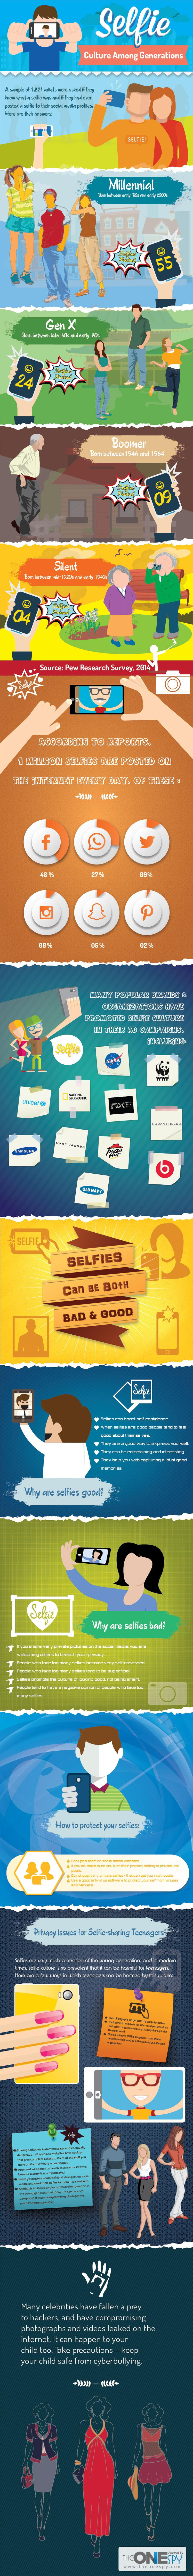 Selfie Culture Among Generations